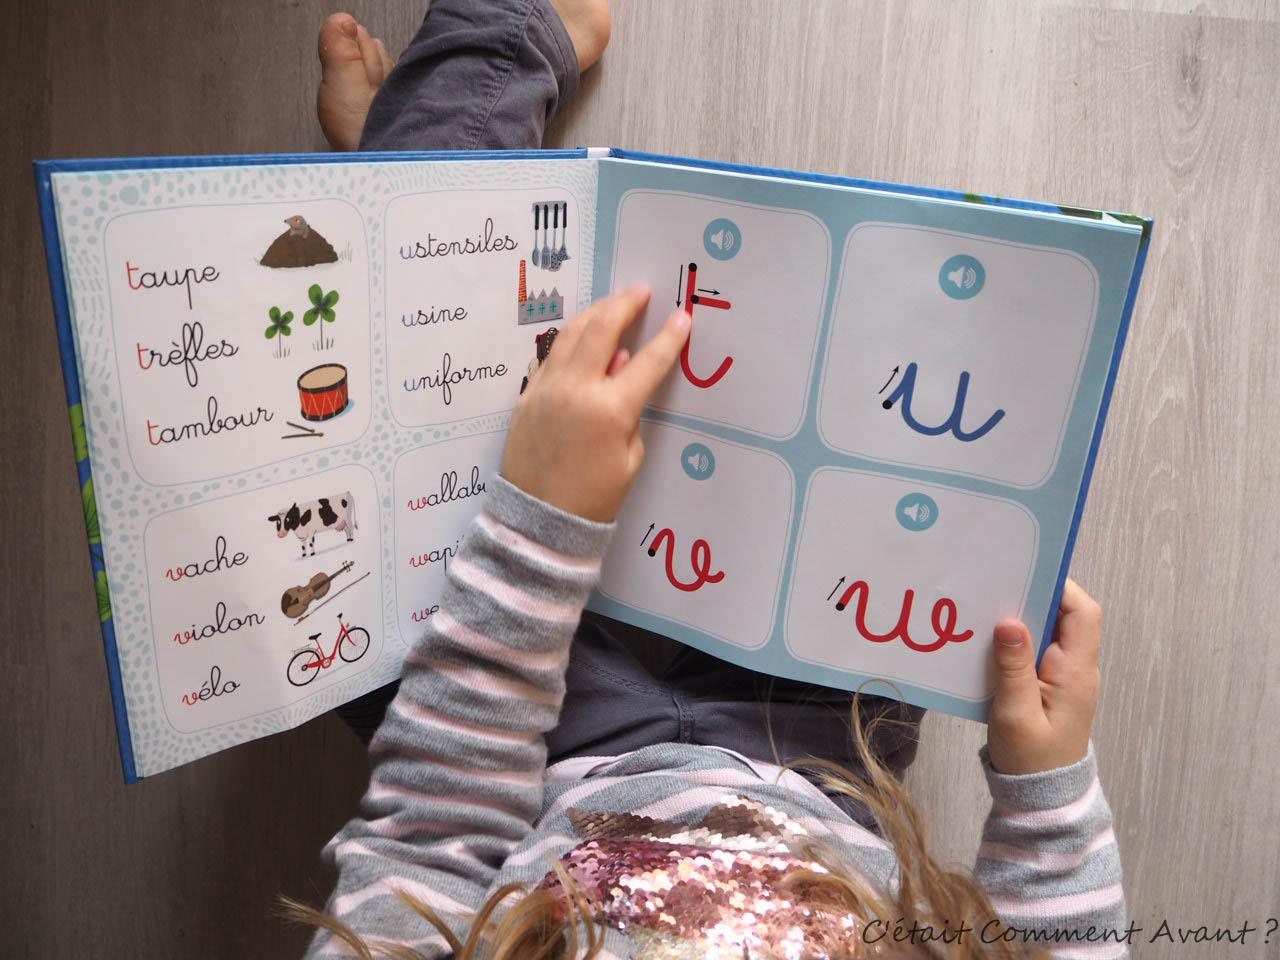 Mon Abecedaire Sonore Montessori De Grund Lecture C Etait Comment Avant